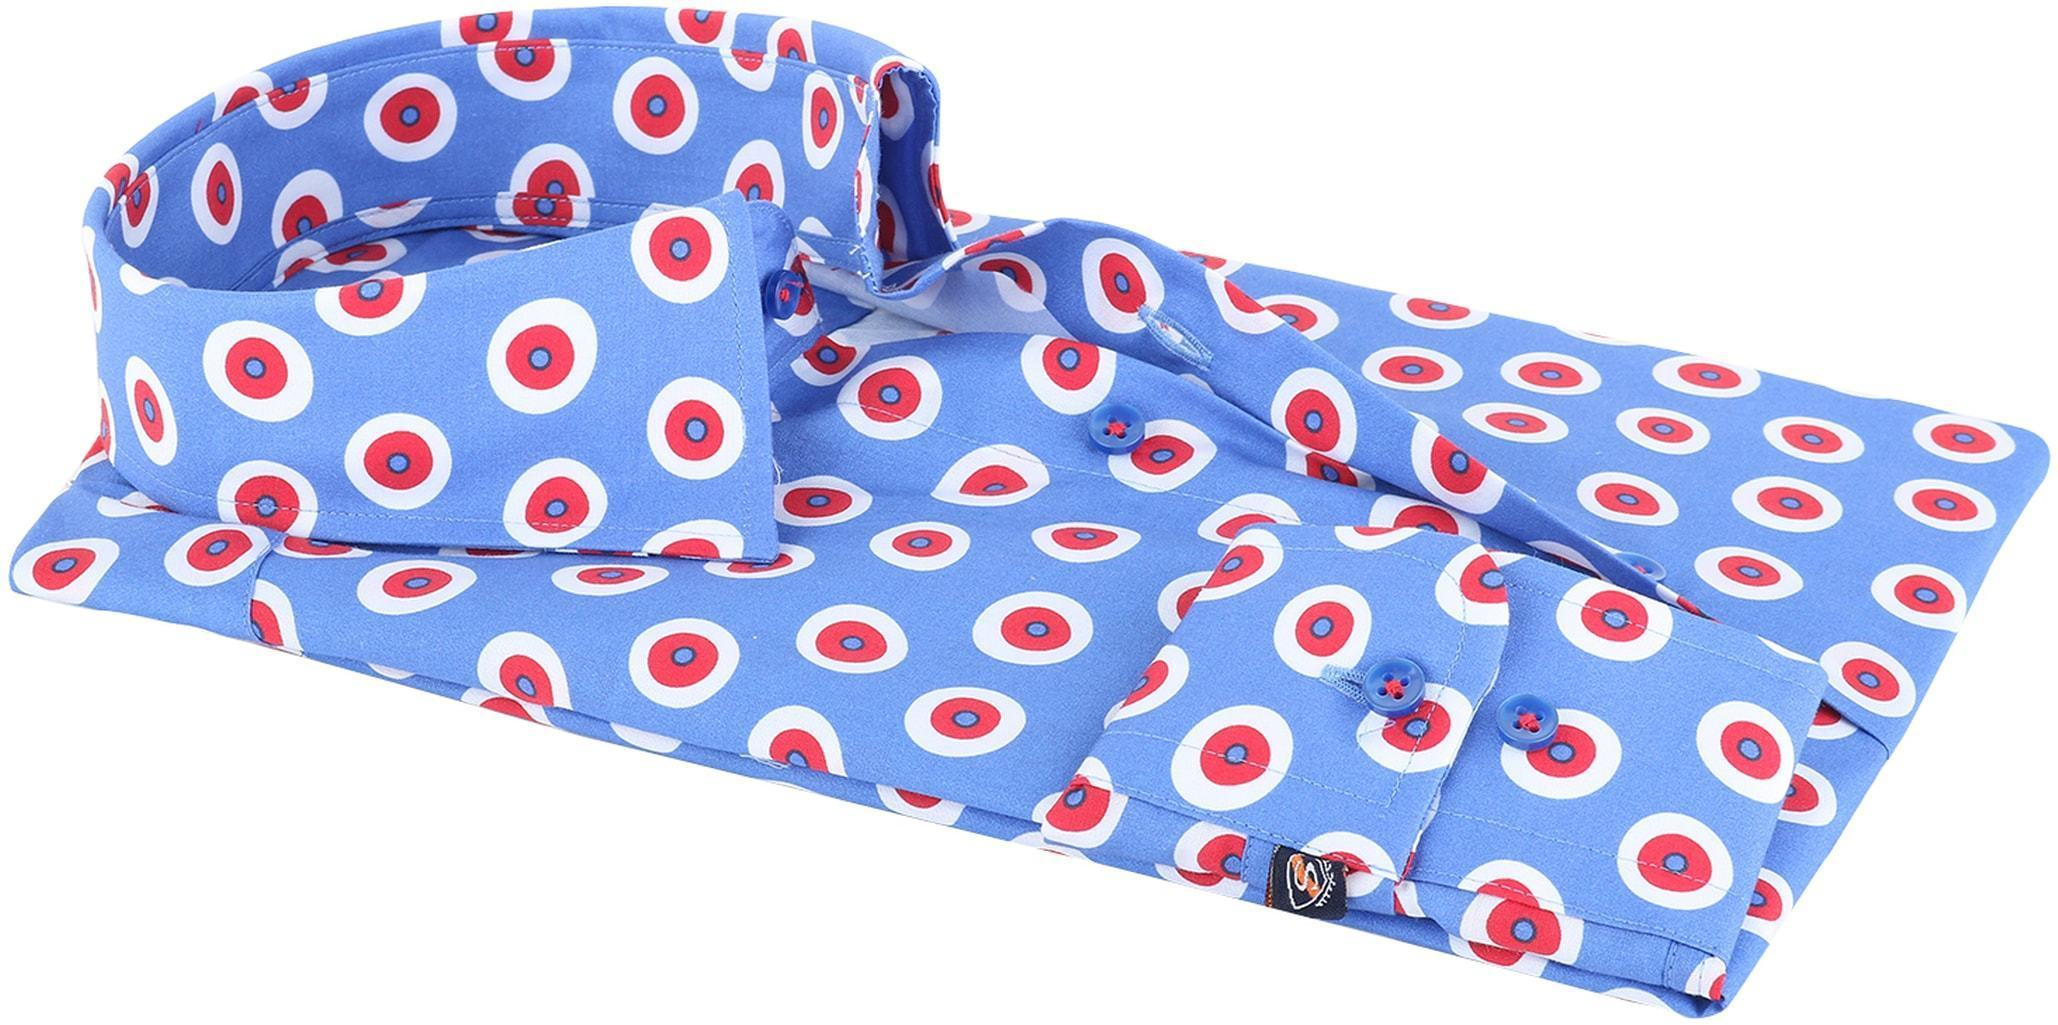 Suitable Overhemd Blauw Rood 141-4 foto 2